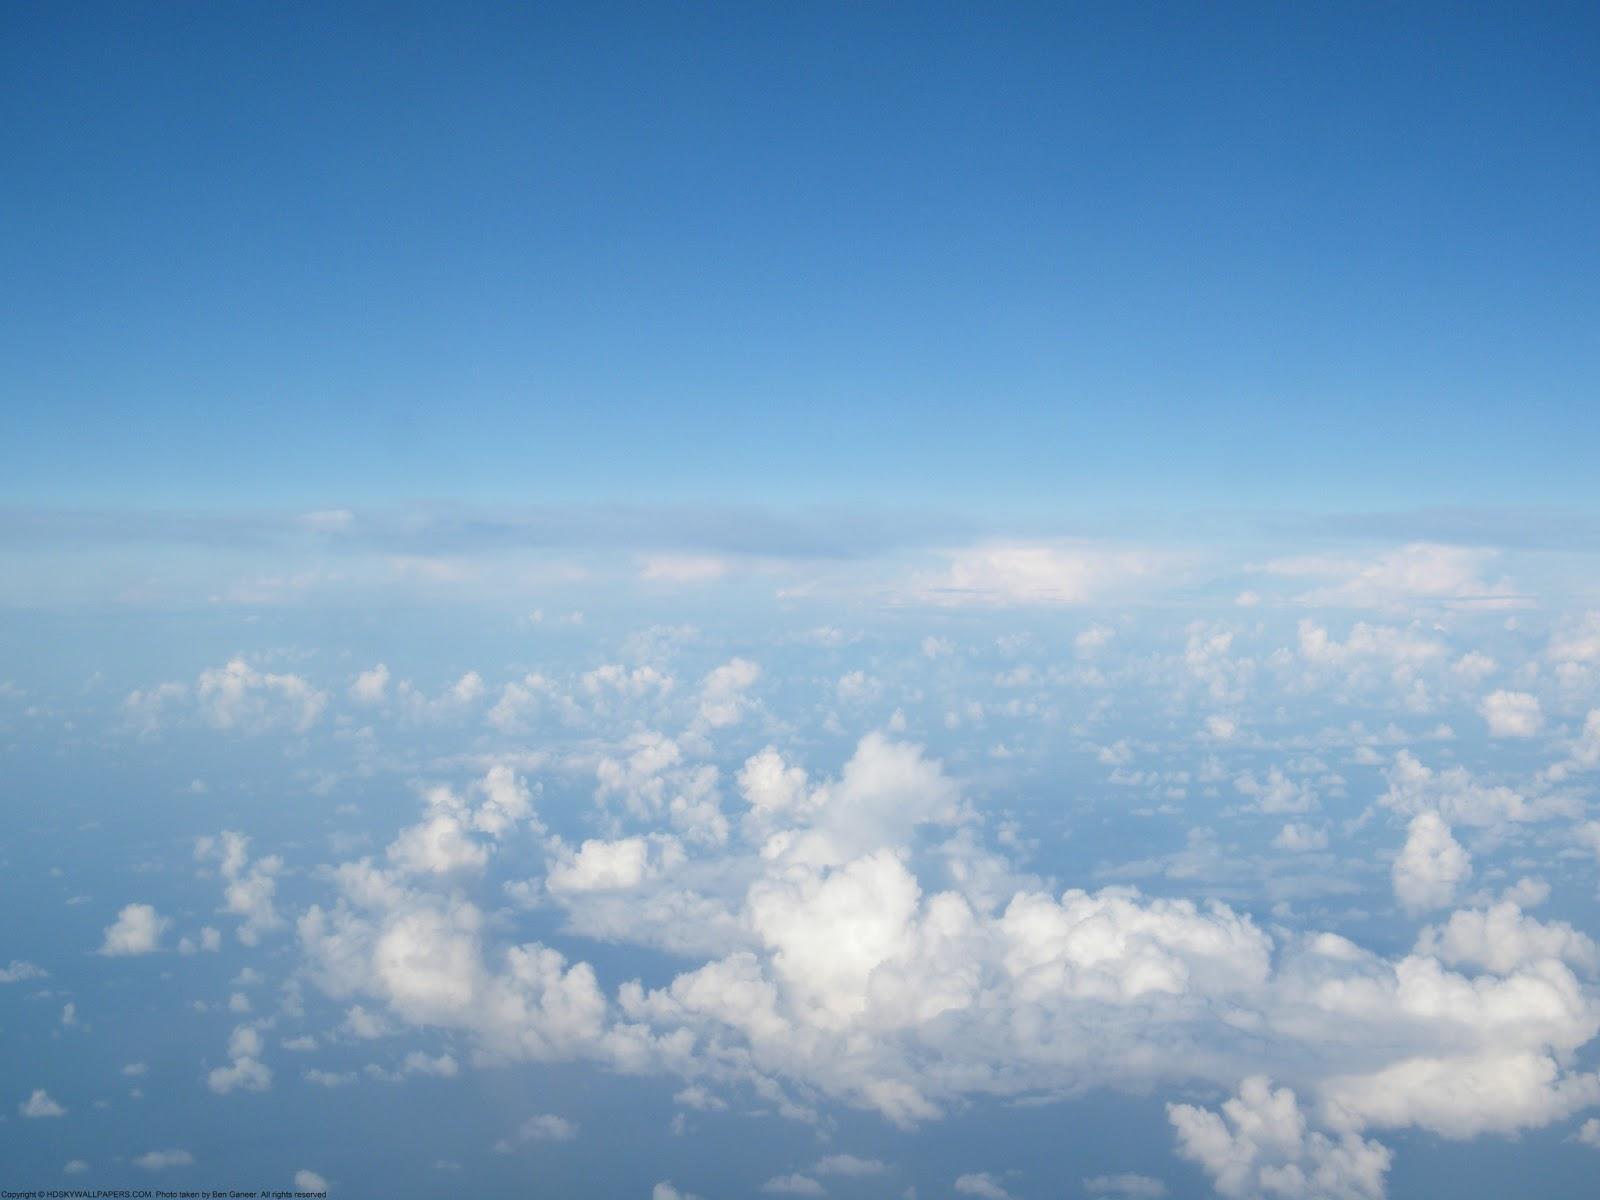 sky cloud wallpapers hd beautiful hd wallpapers for desktop